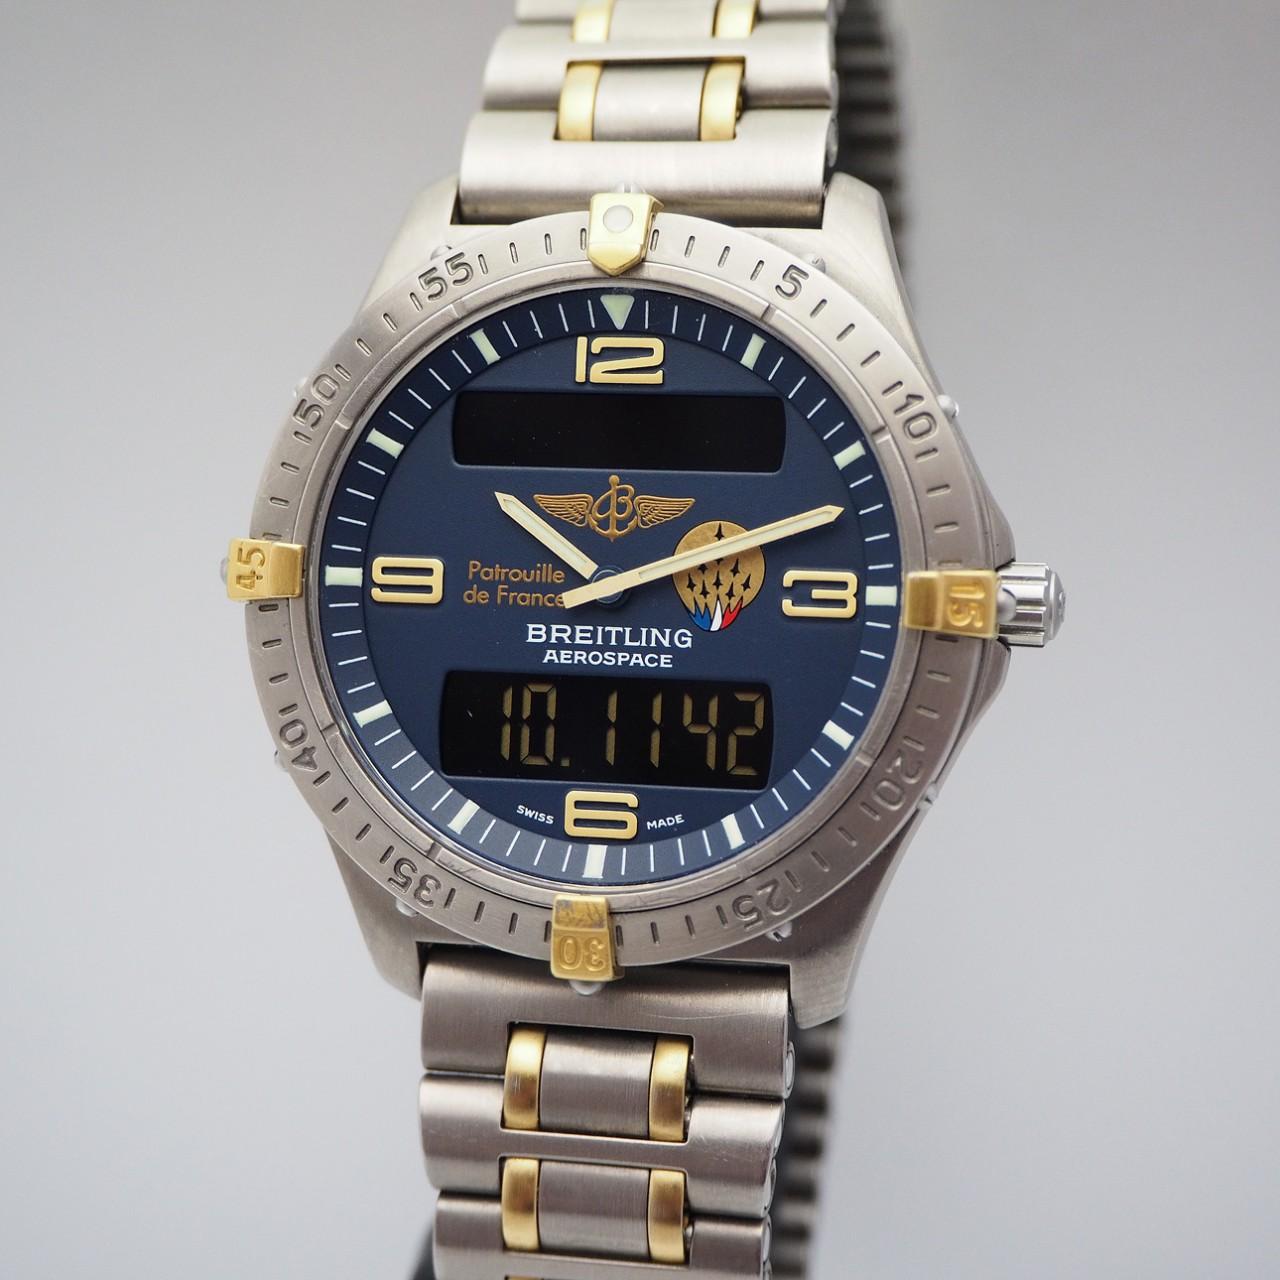 Breitling Aerospace Limited Edition F56062, Titan/ Gold, Box+Docs